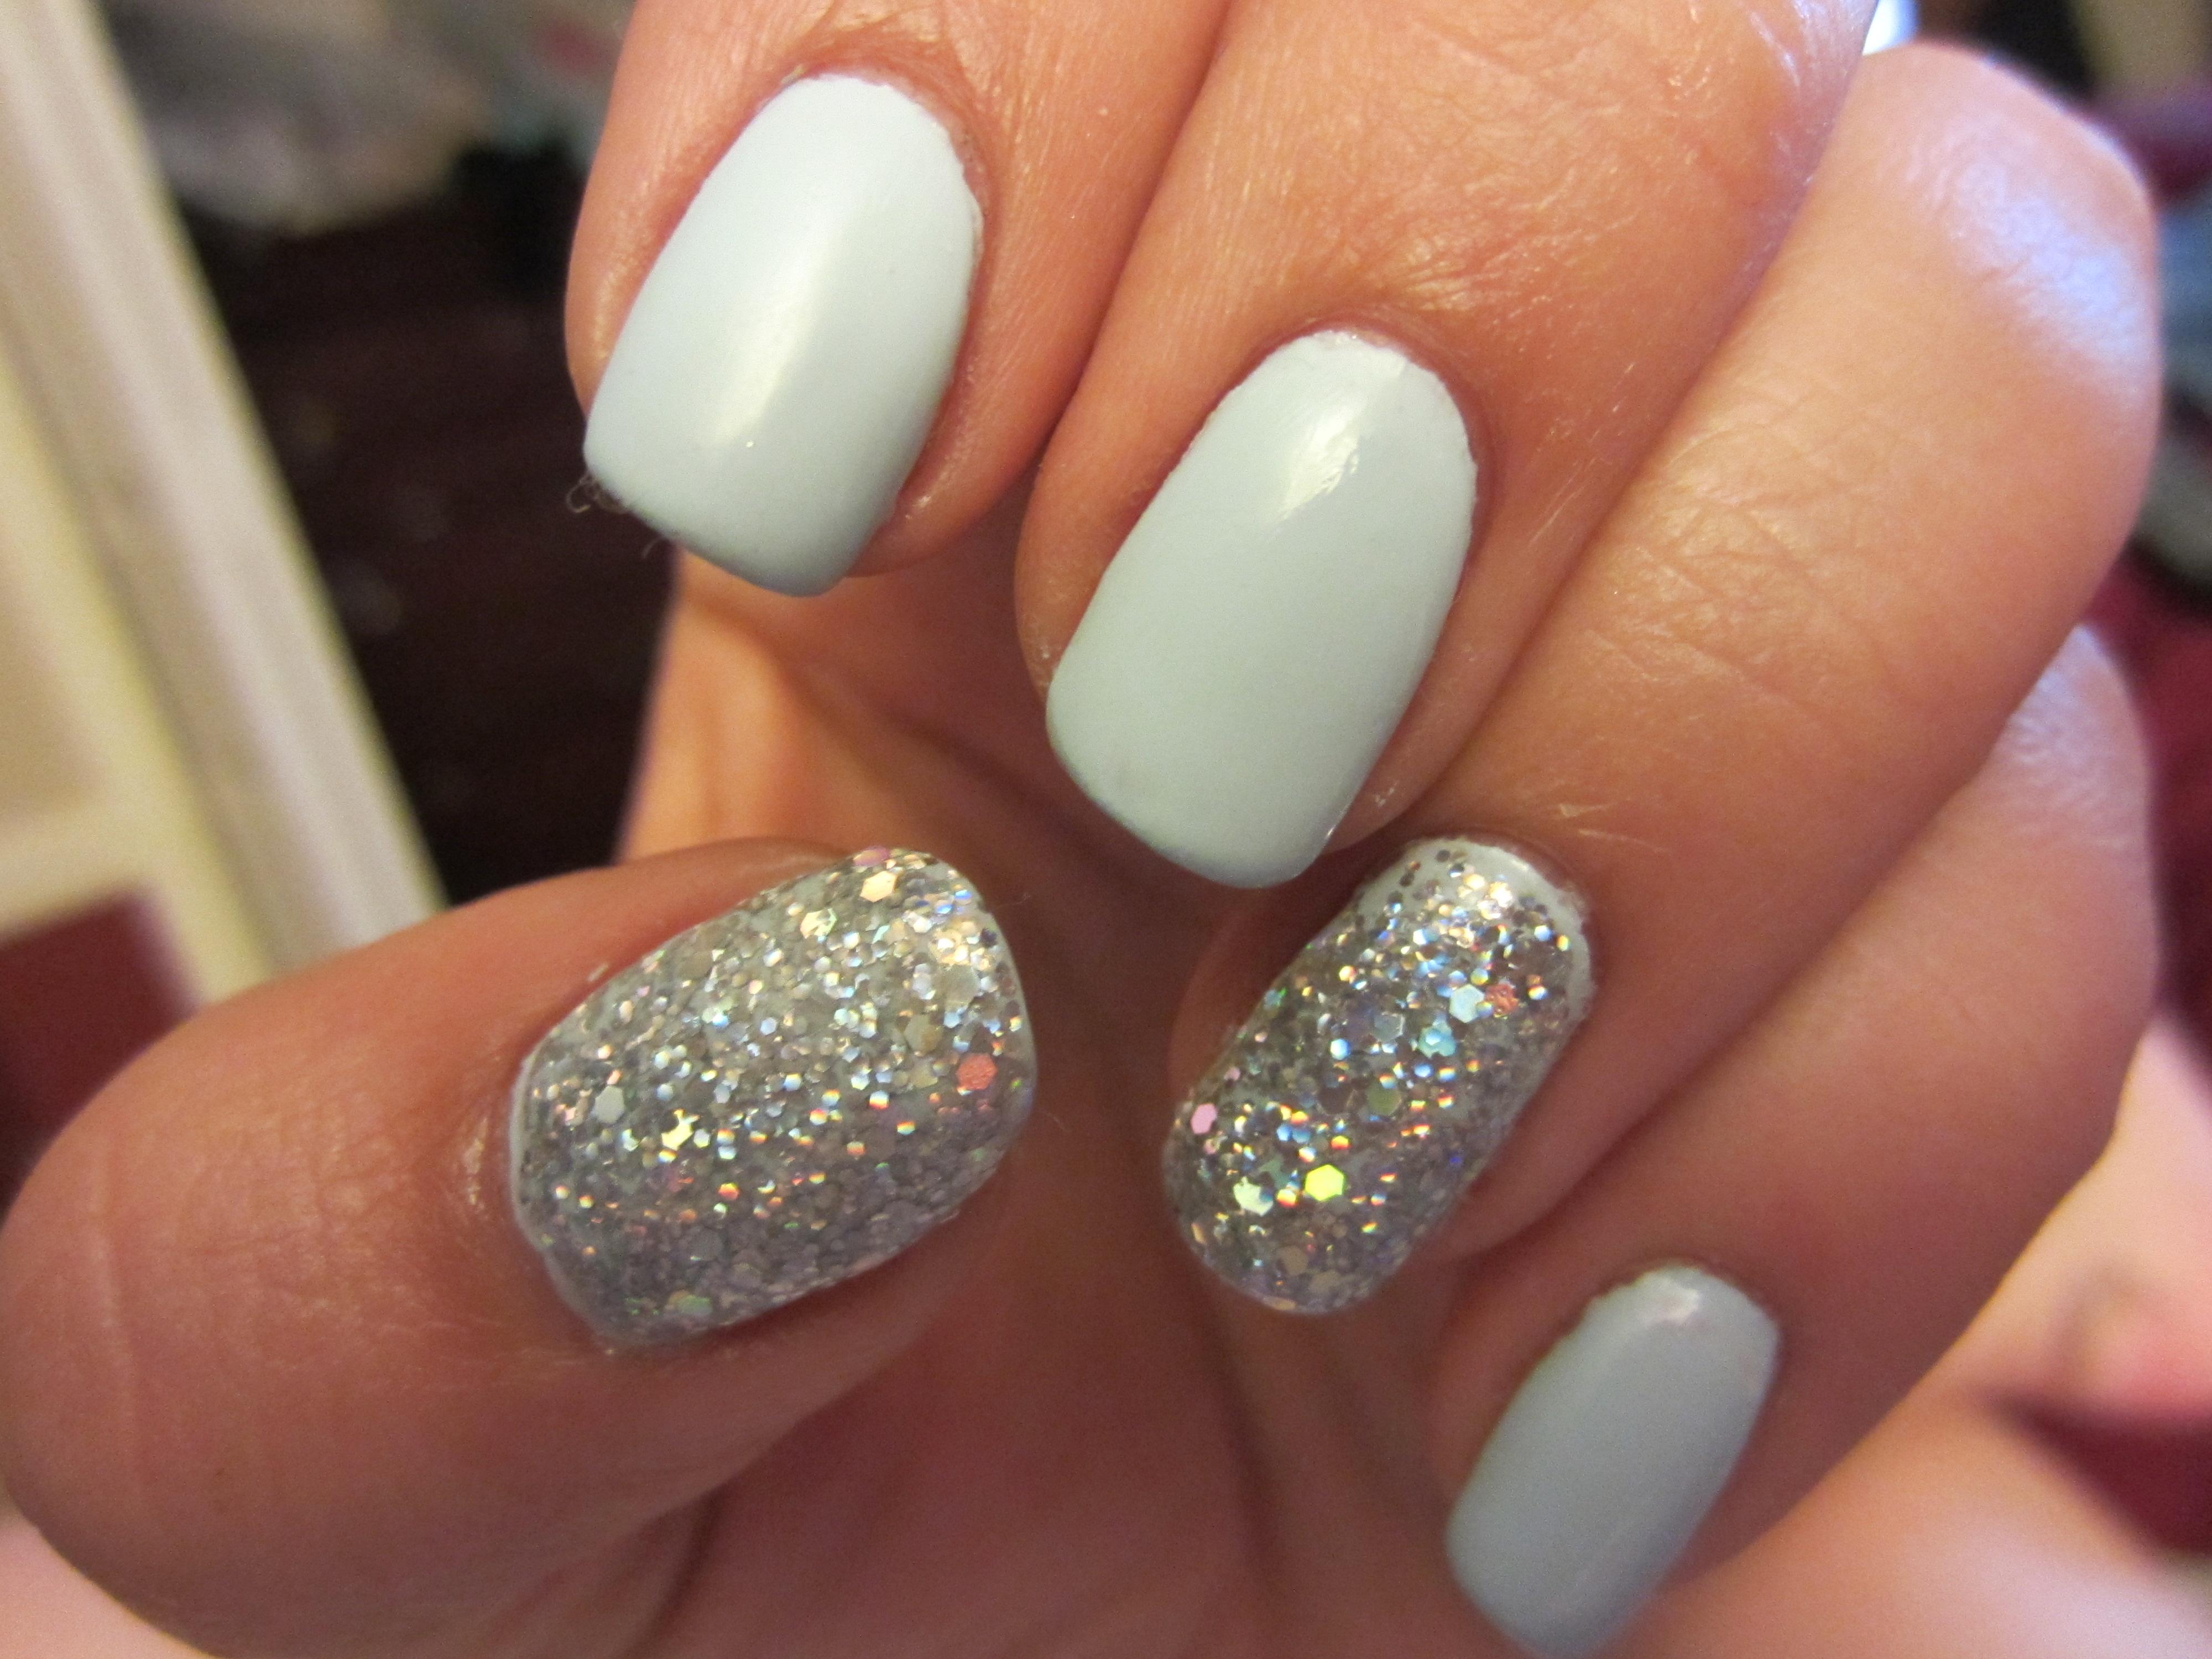 Essie Chunky Glitter Nail Polish - To Bend Light